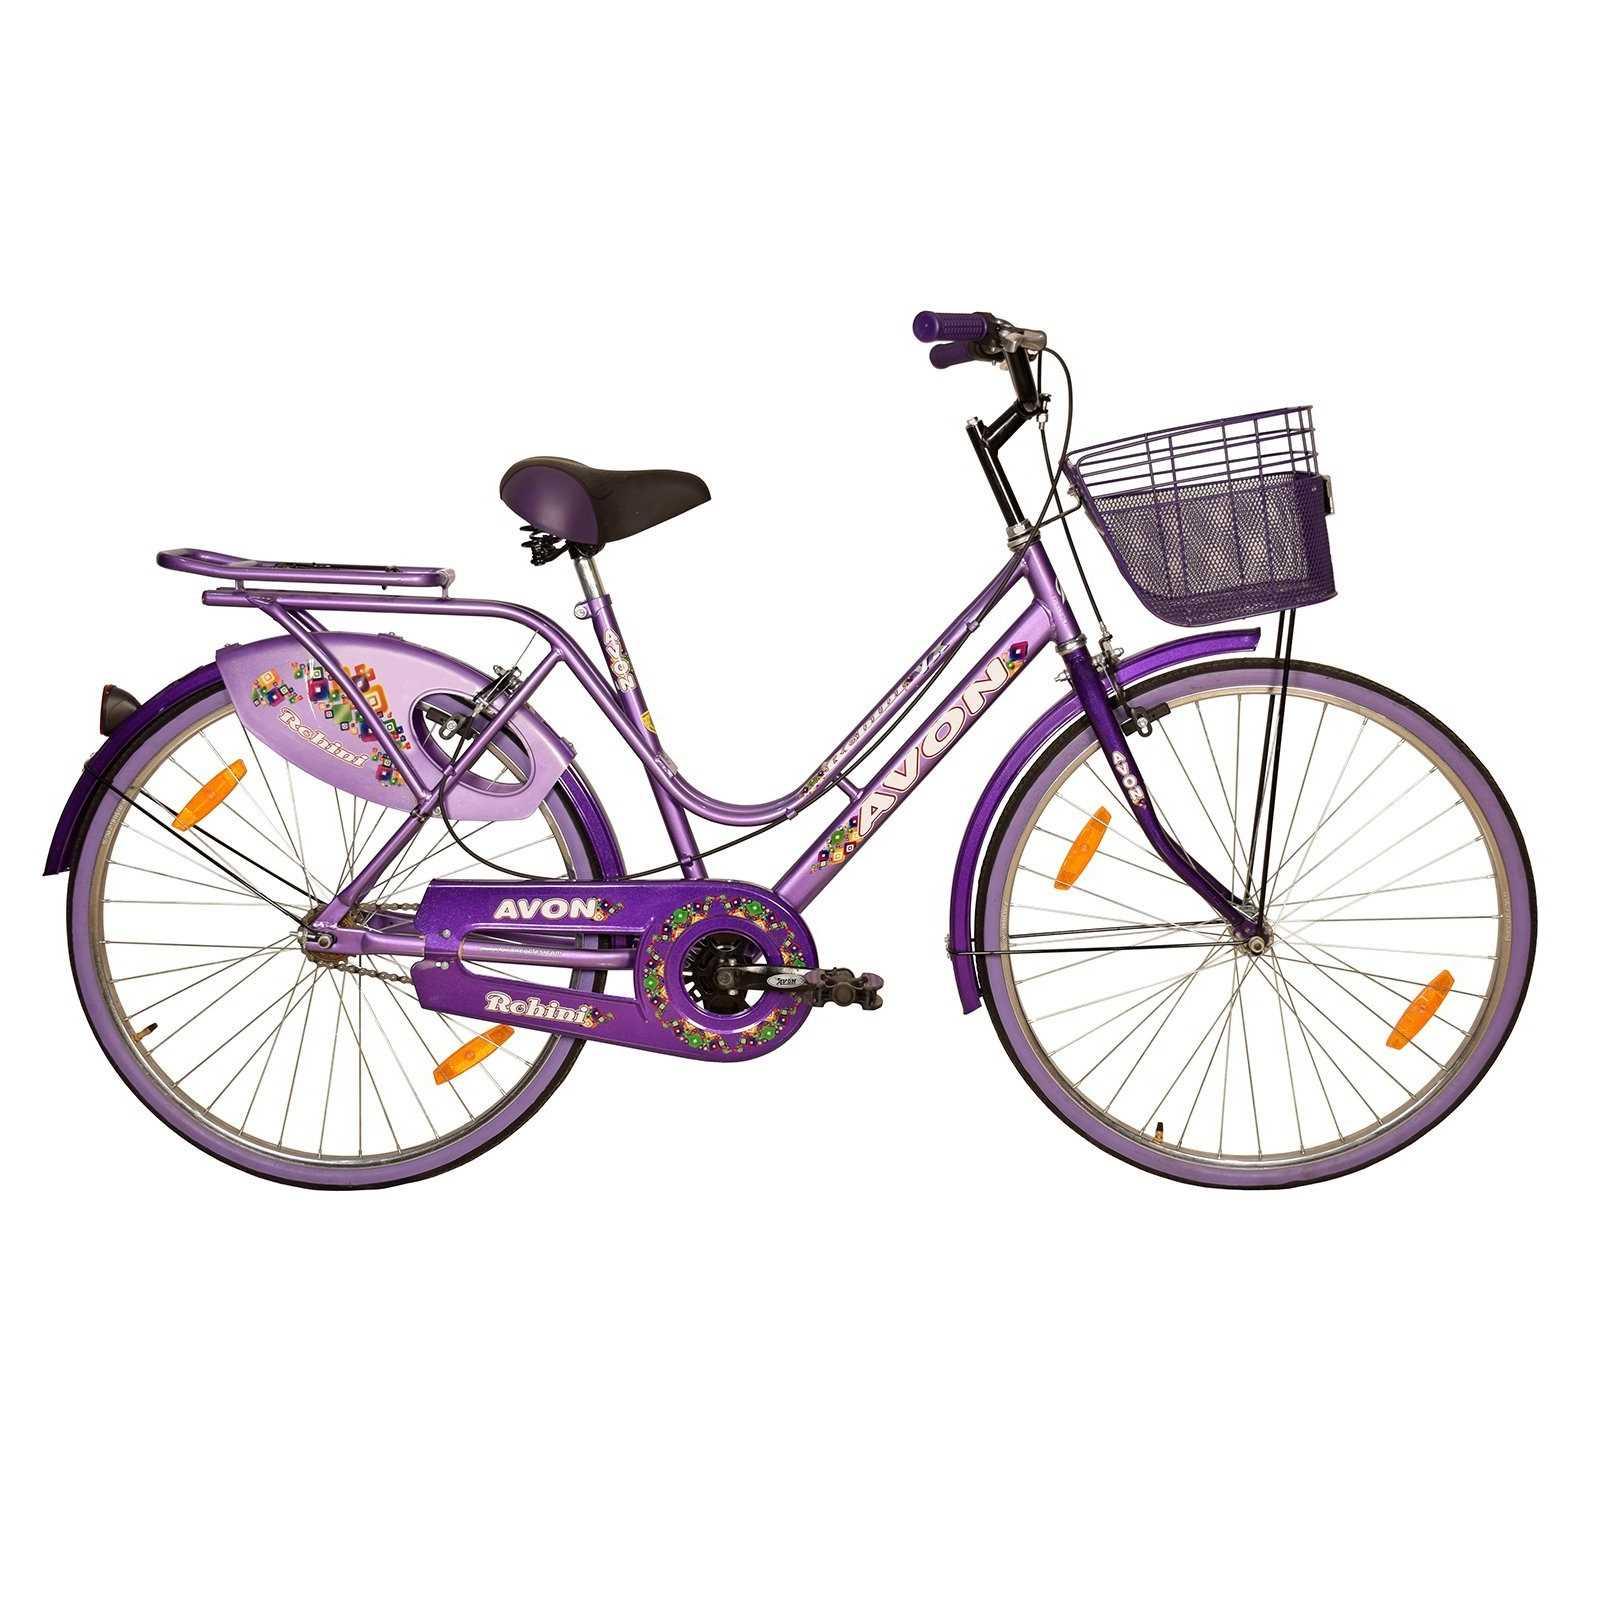 avon rohini vx 26t single speed road cycle price 11 nov 2018